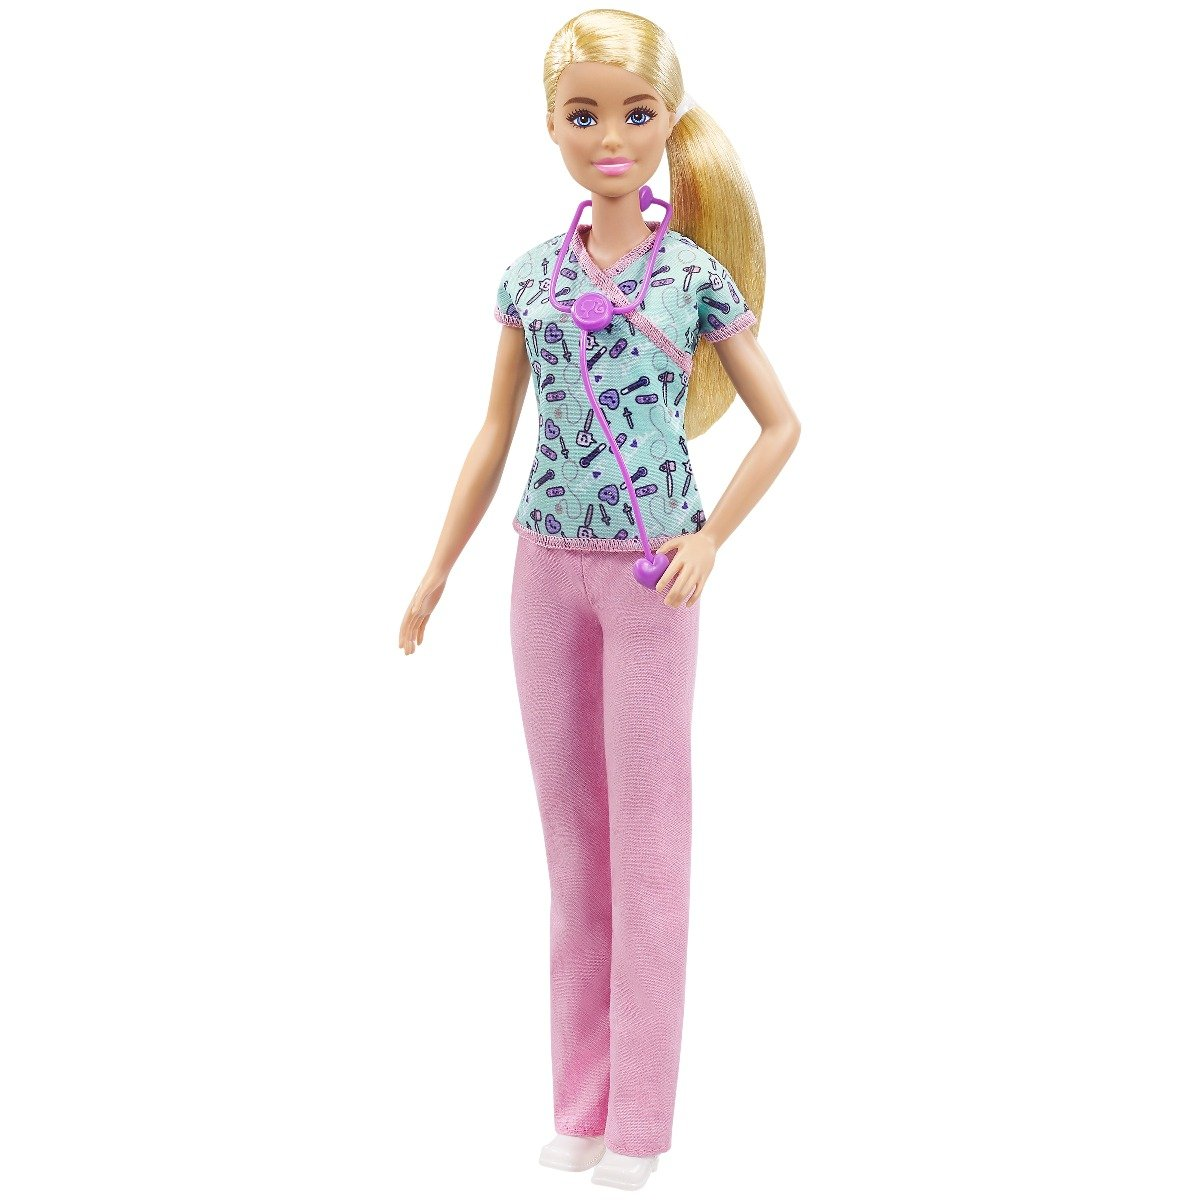 Papusa Barbie Career, Asistenta medicala GTW39